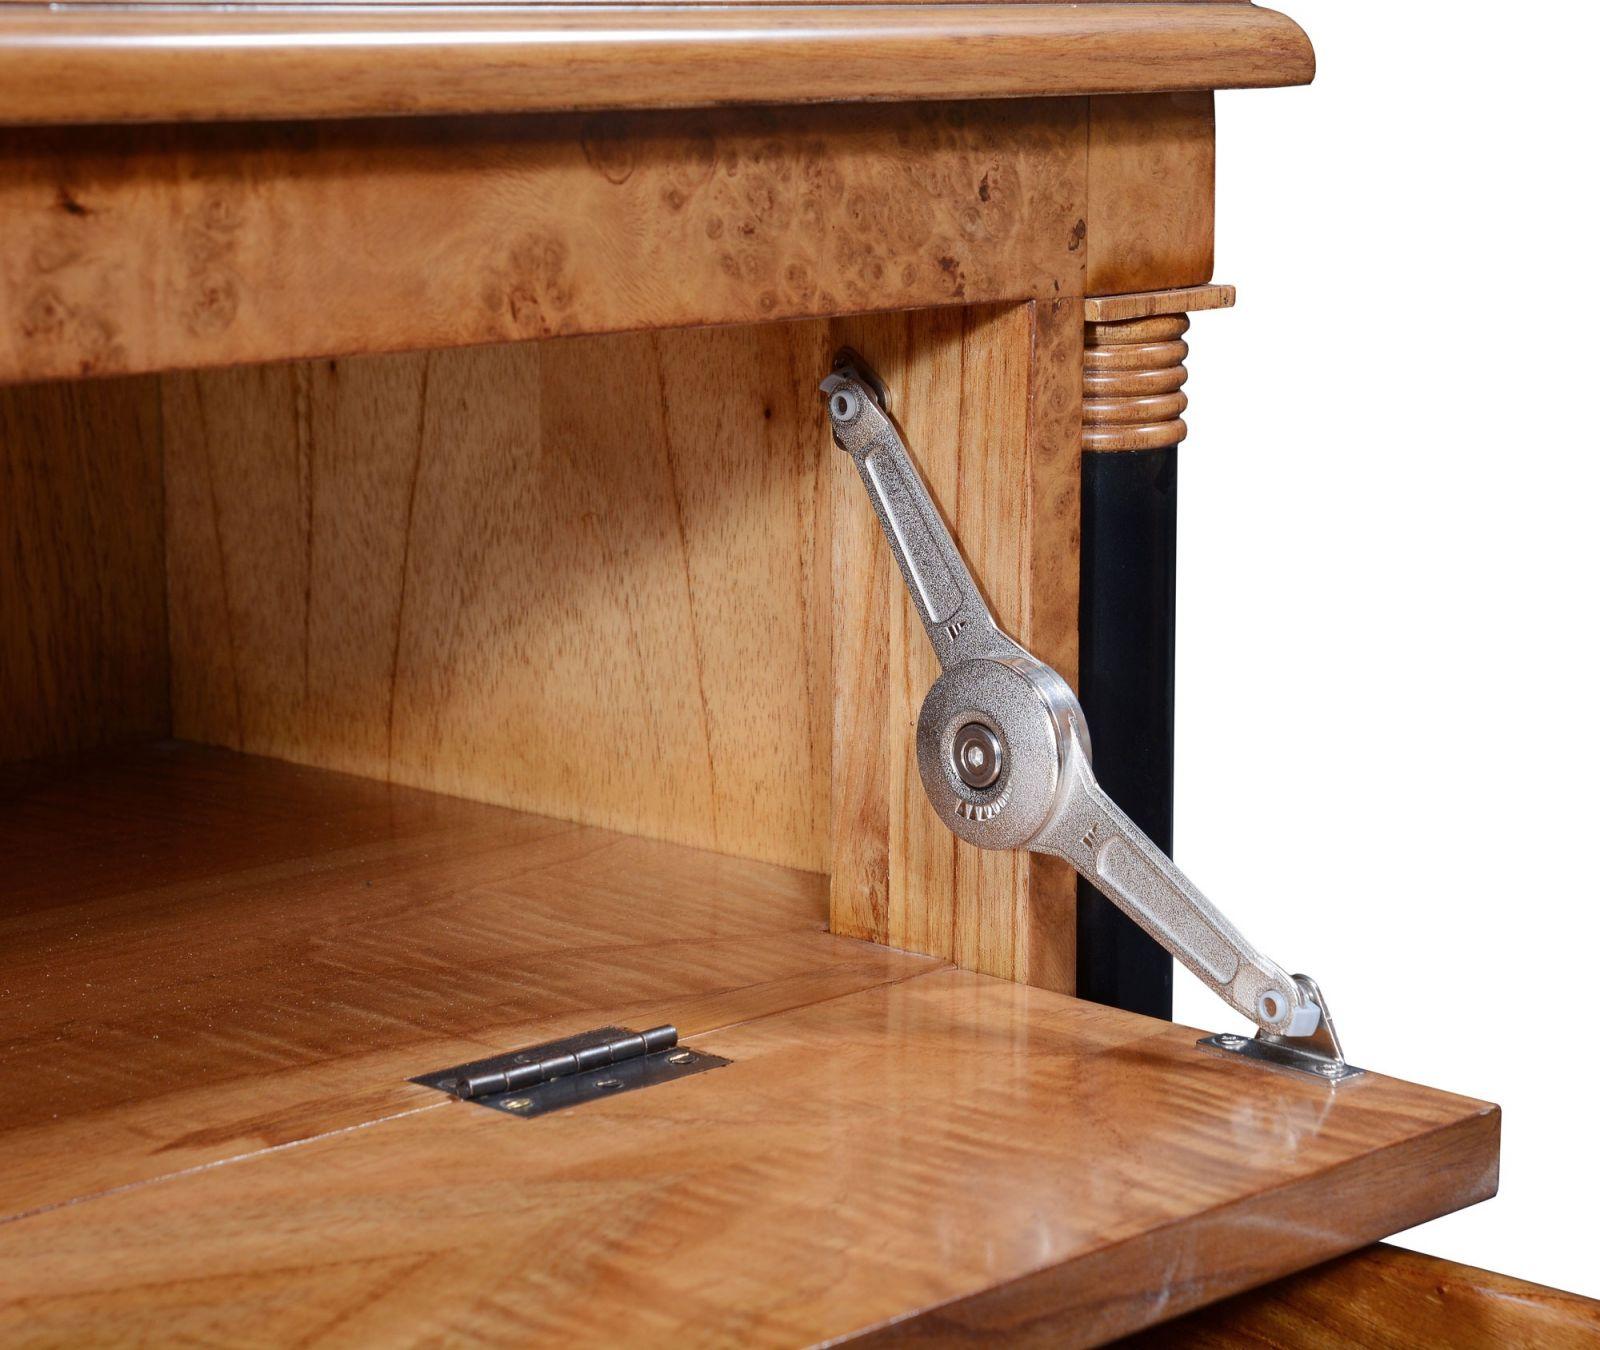 Empire television stand - honey burr oak with ebony line